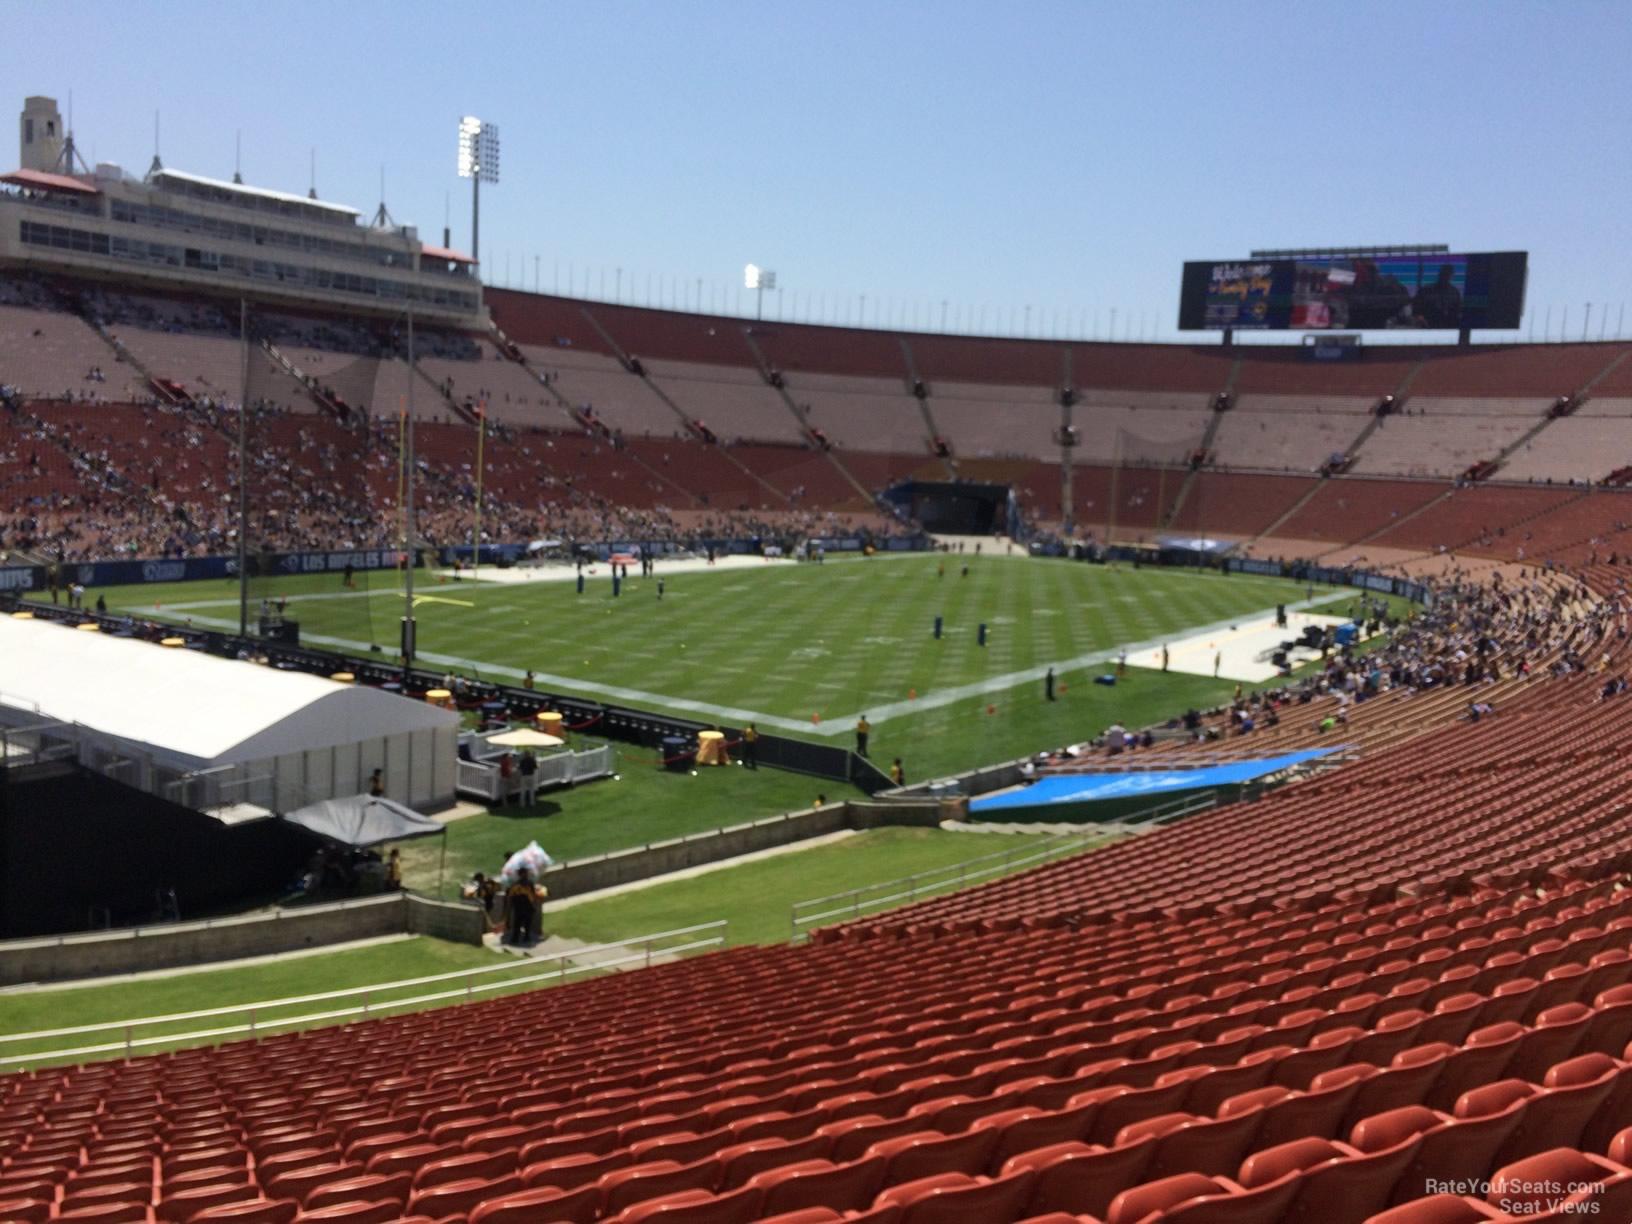 Los Angeles Memorial Coliseum Section 28 - RateYourSeats.com